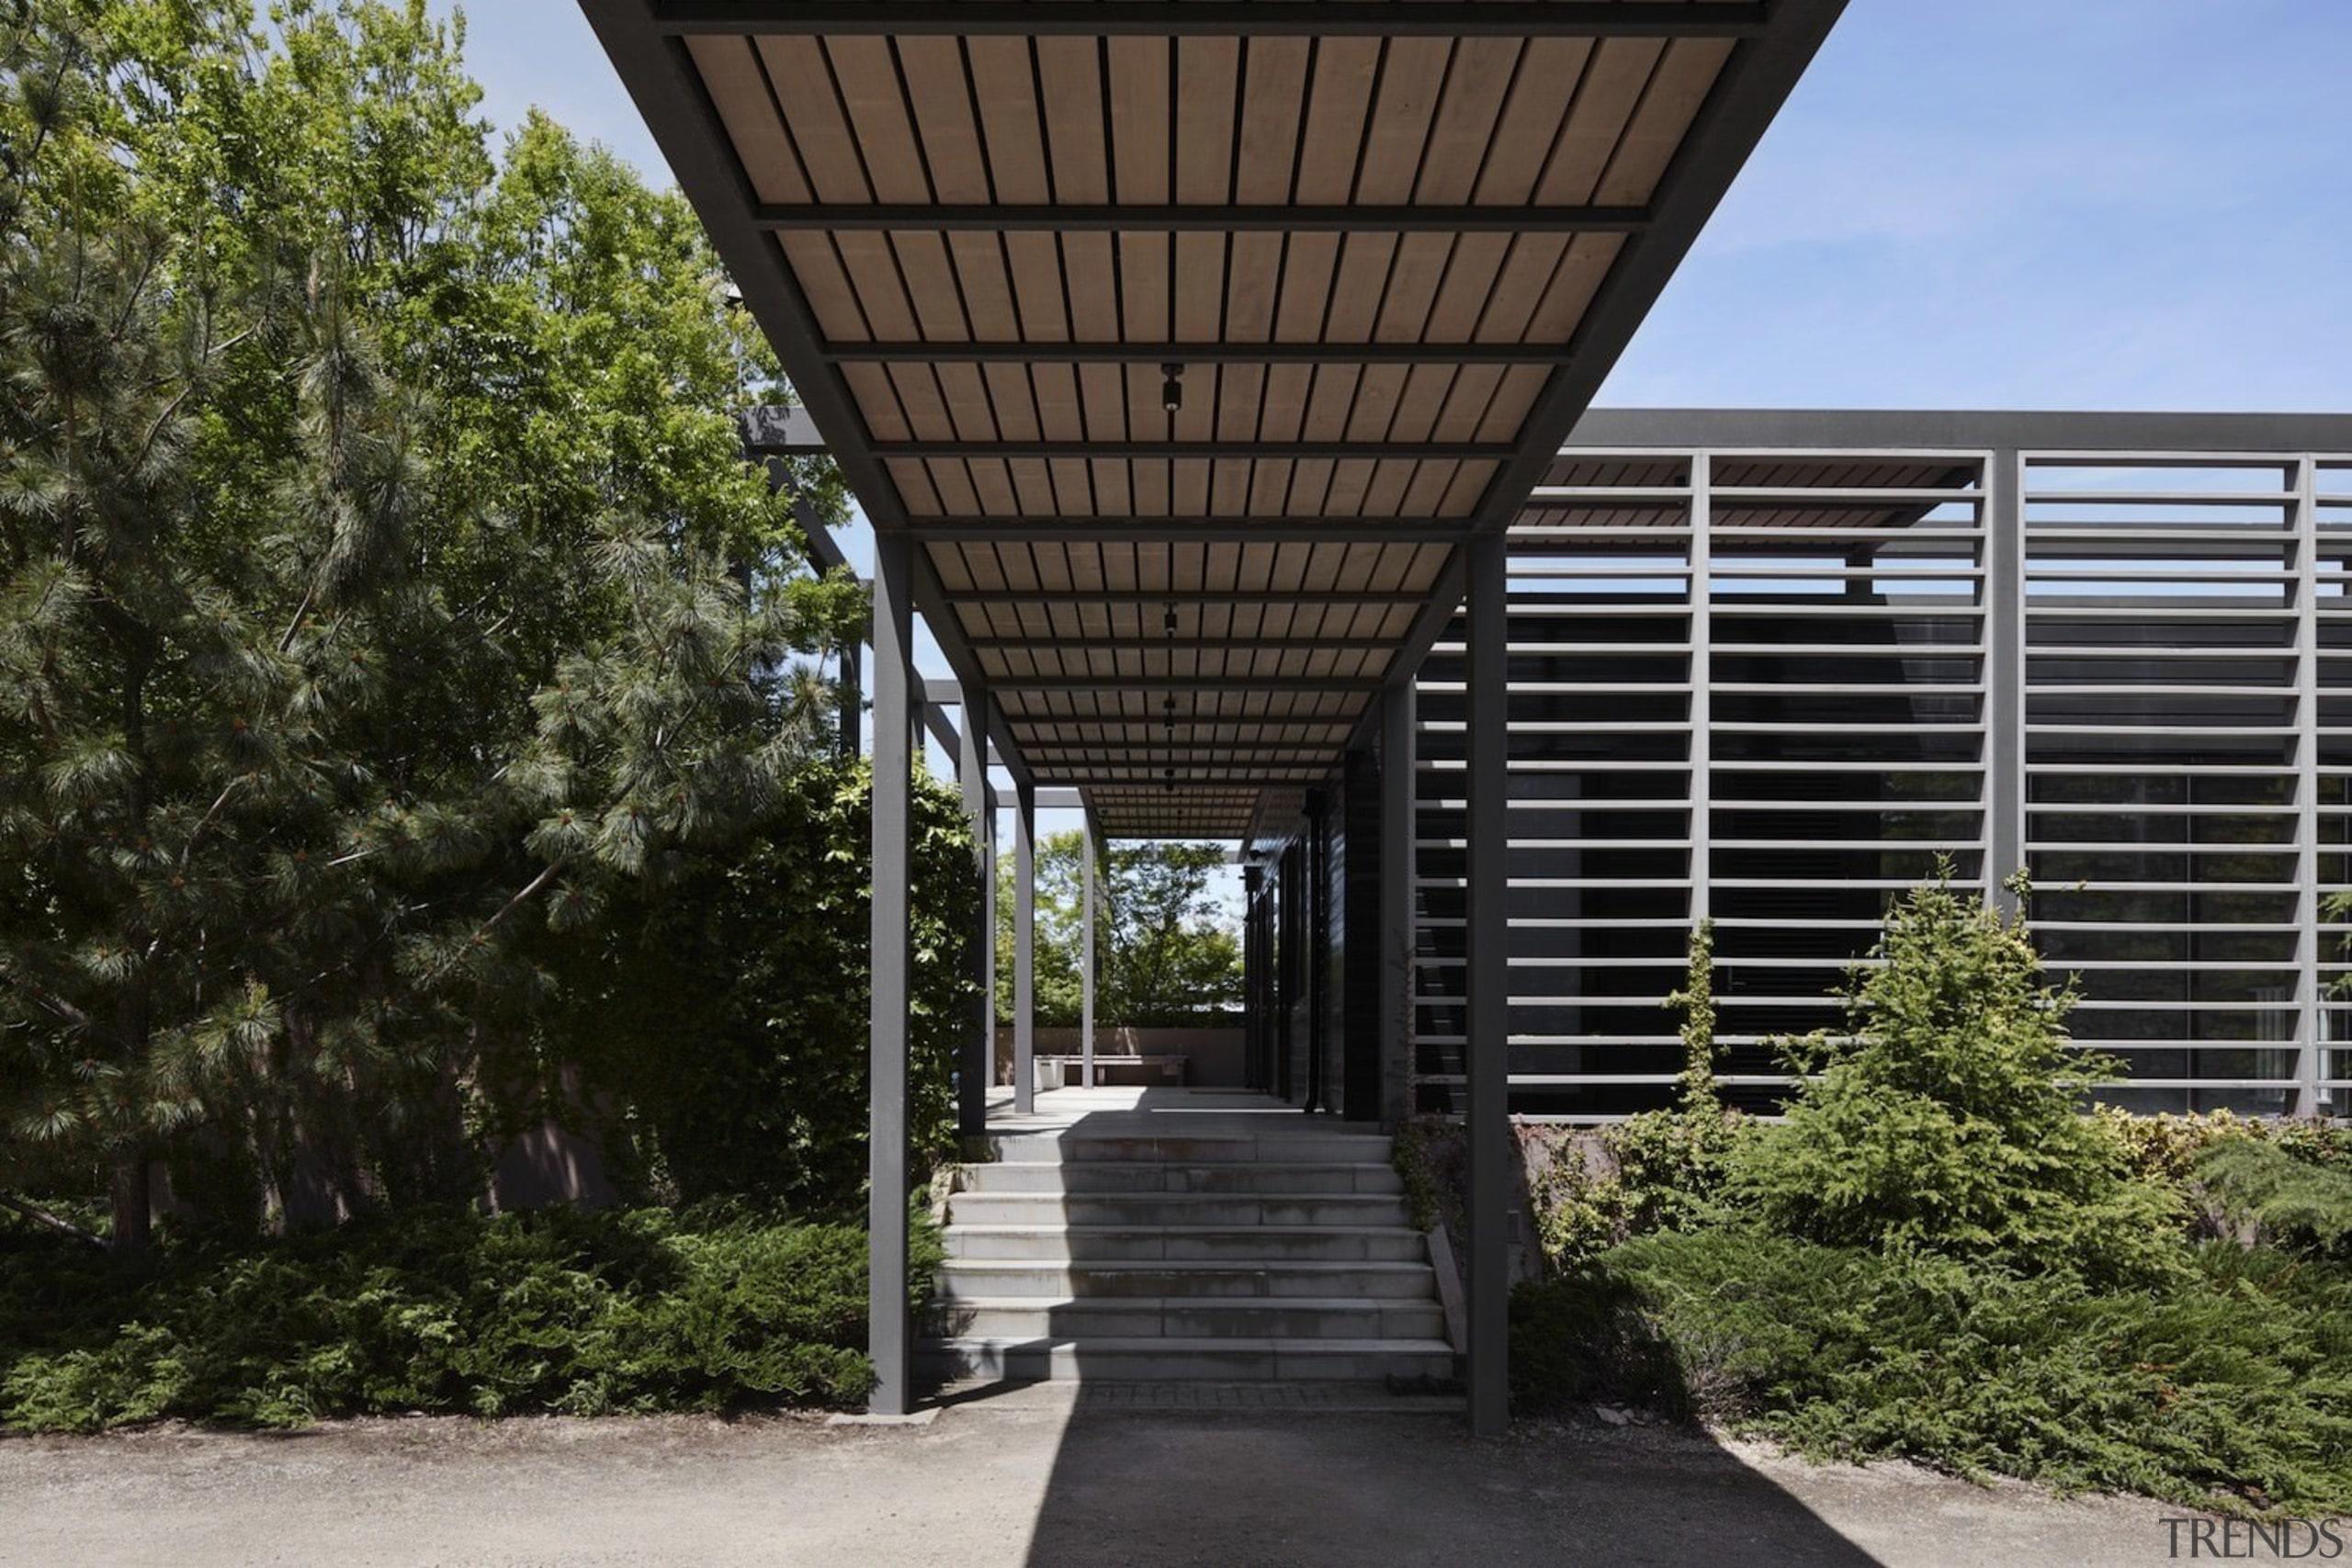 Architect: B.E Architecture architecture, facade, house, real estate, structure, walkway, black, brown